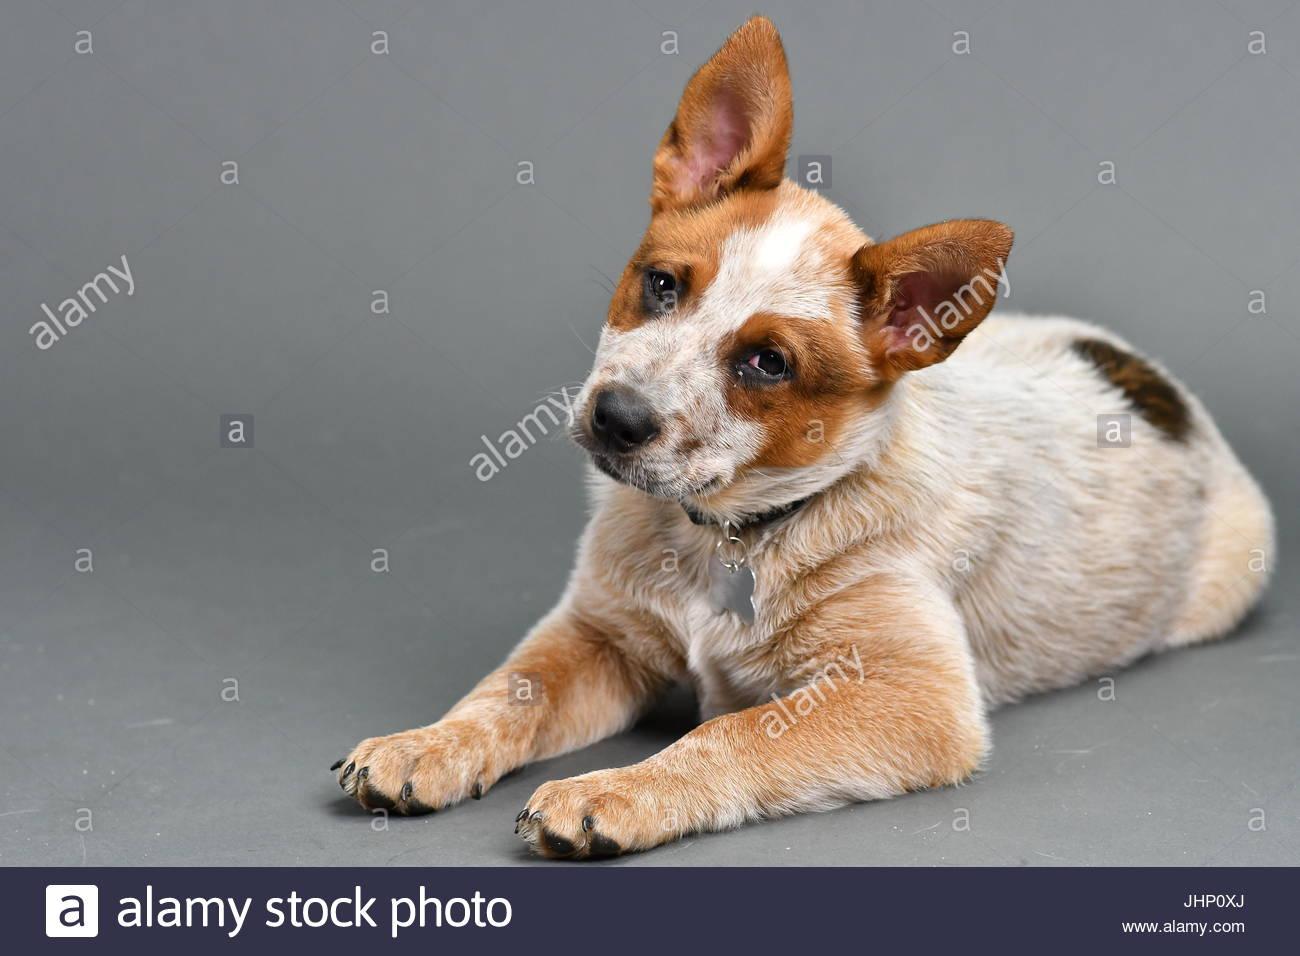 Australian cattle dog puppy on gray background - Stock Image